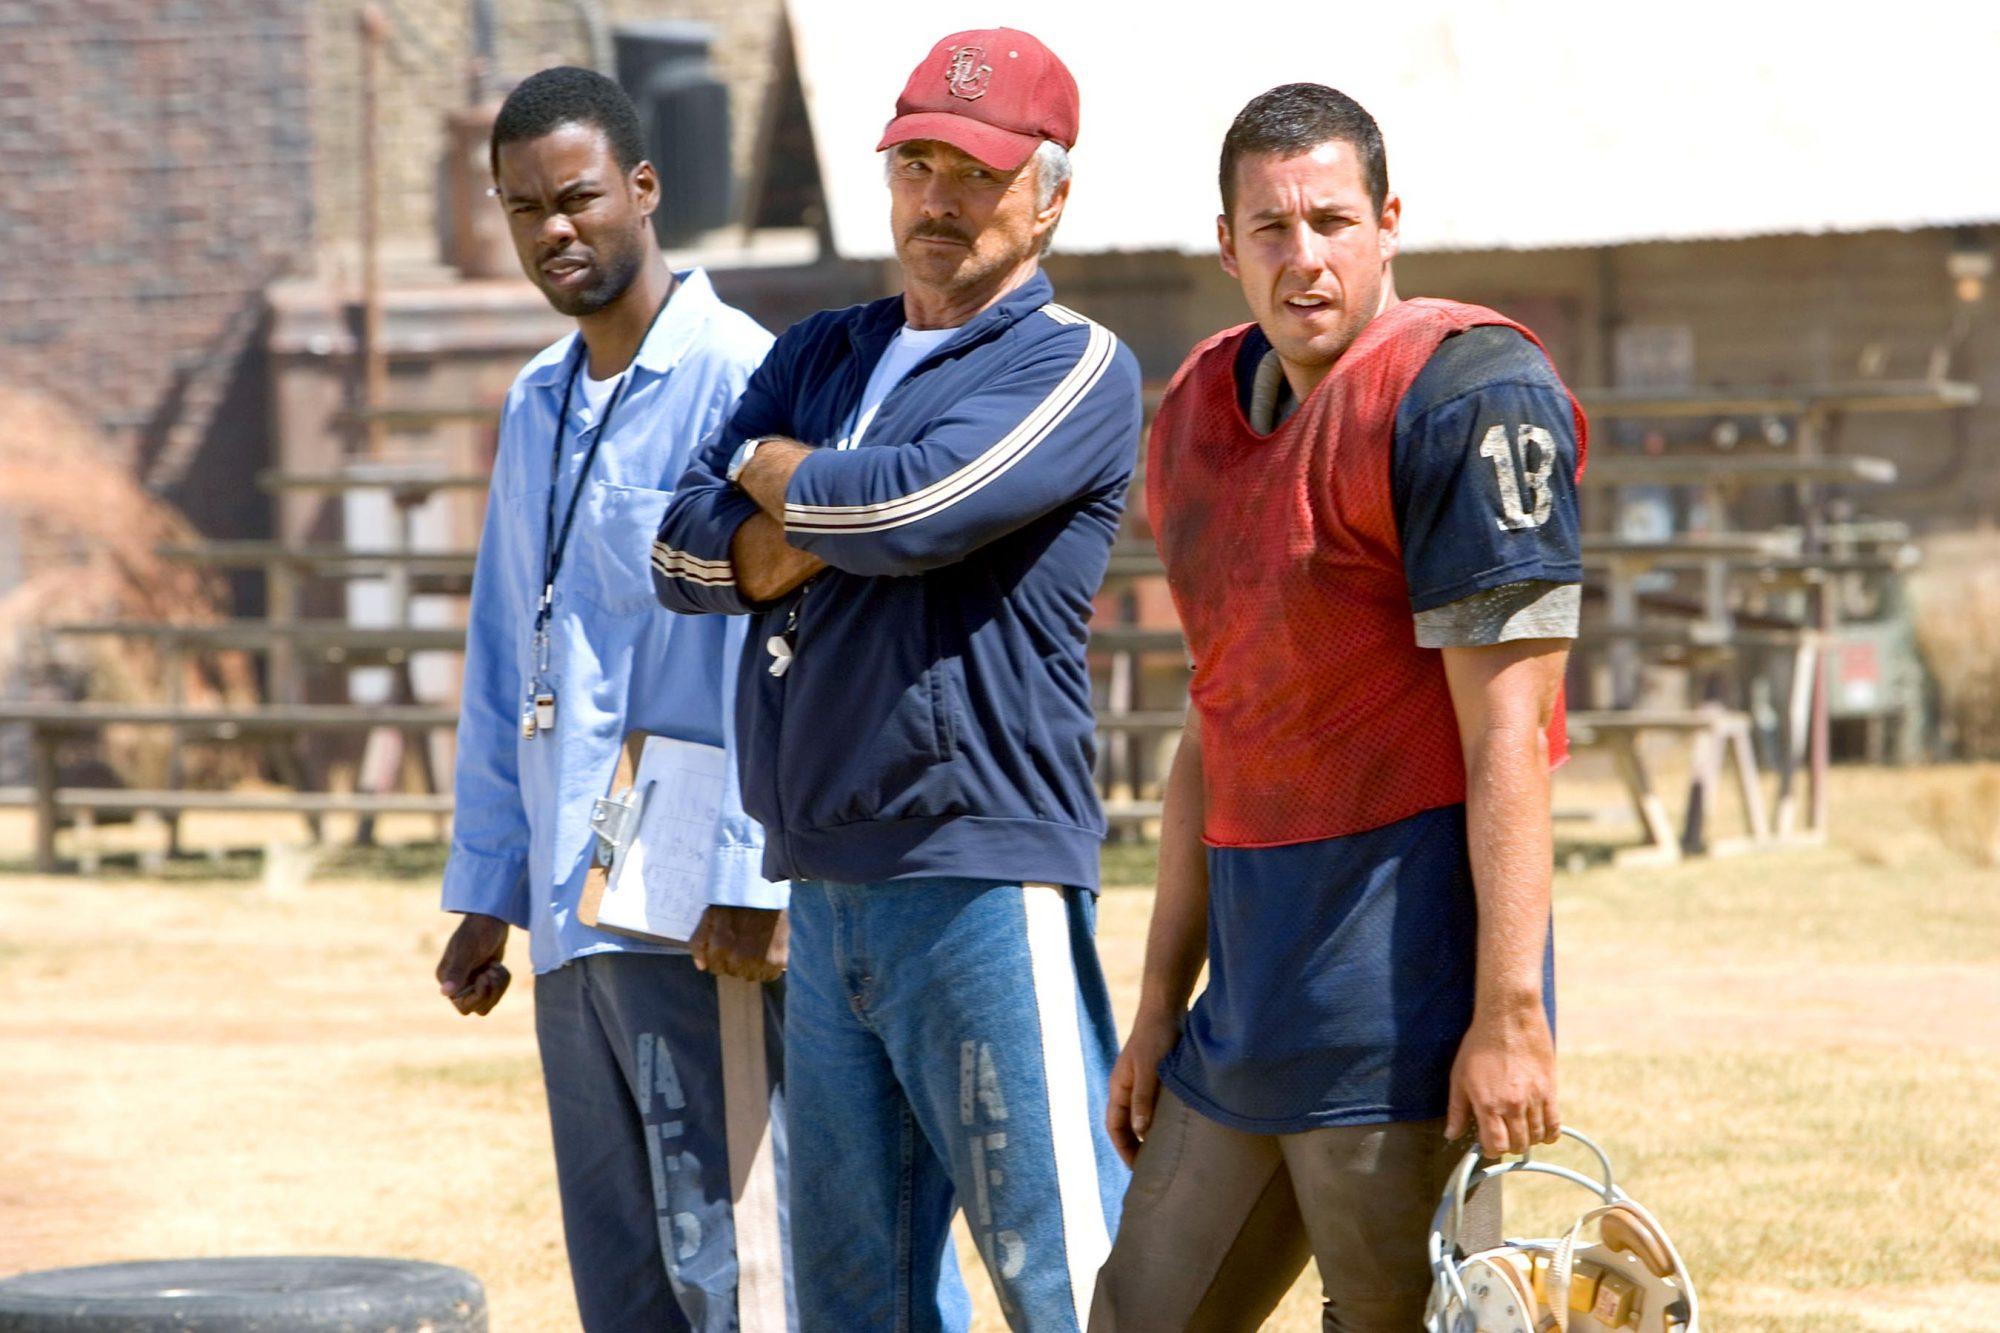 THE LONGEST YARD, Chris Rock, Burt Reynolds, Adam Sandler, 2005, (c) Paramount/courtesy Everett Coll